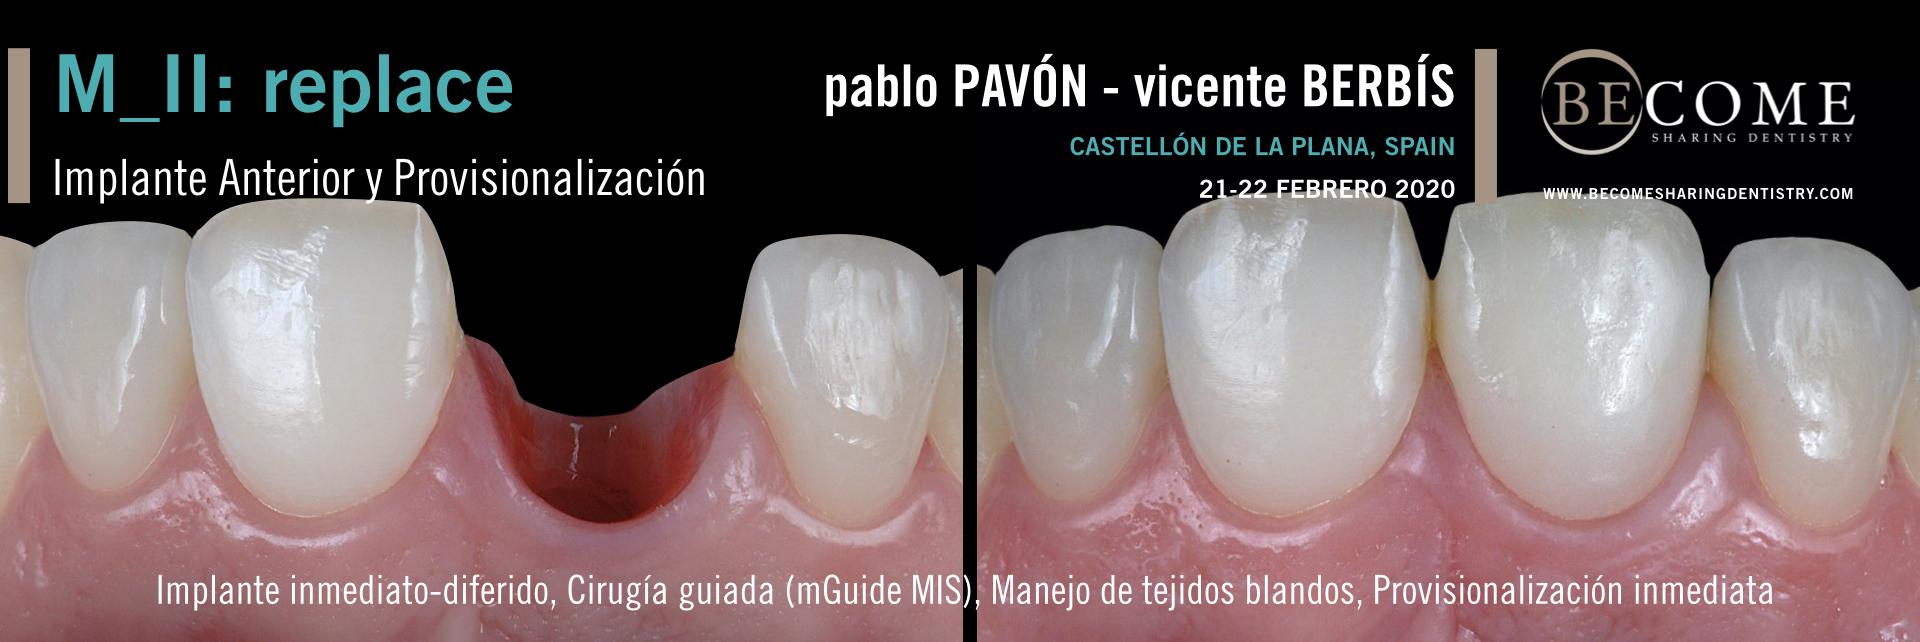 MÓDULO II_REPLACE<br>Implante Unitario Anterior